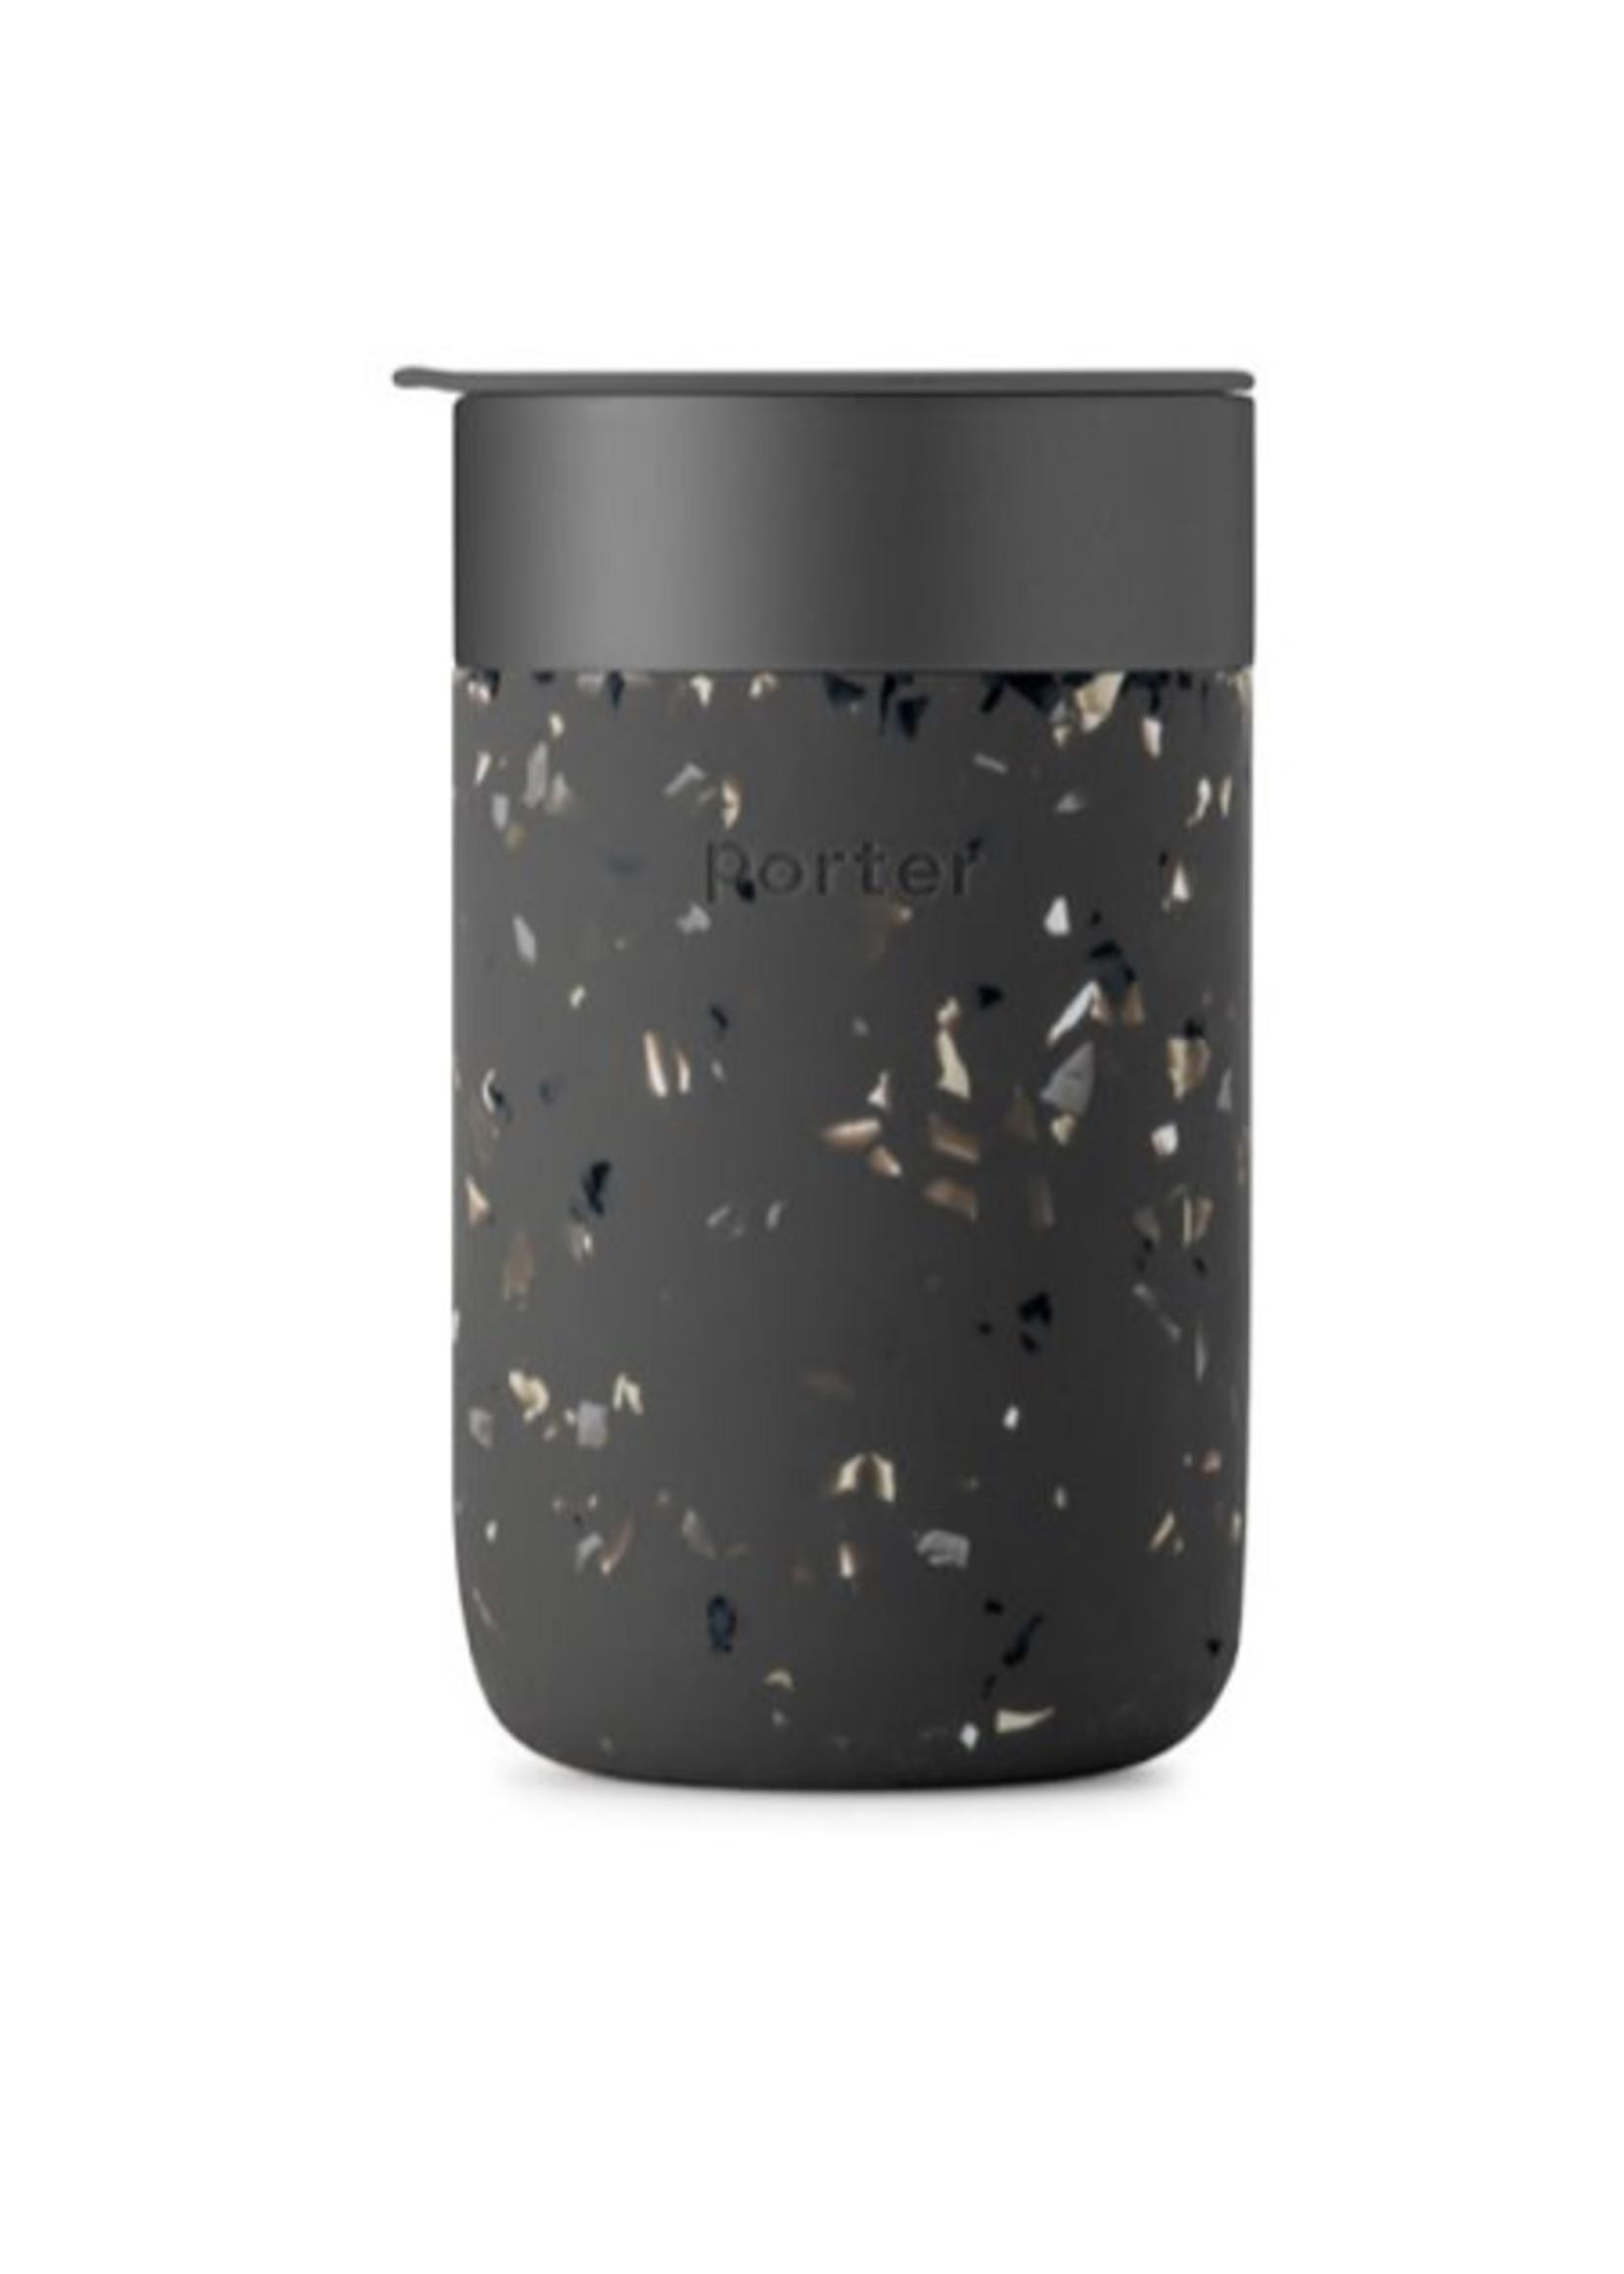 Porter Ceramic Mug - 16oz Terrazzo